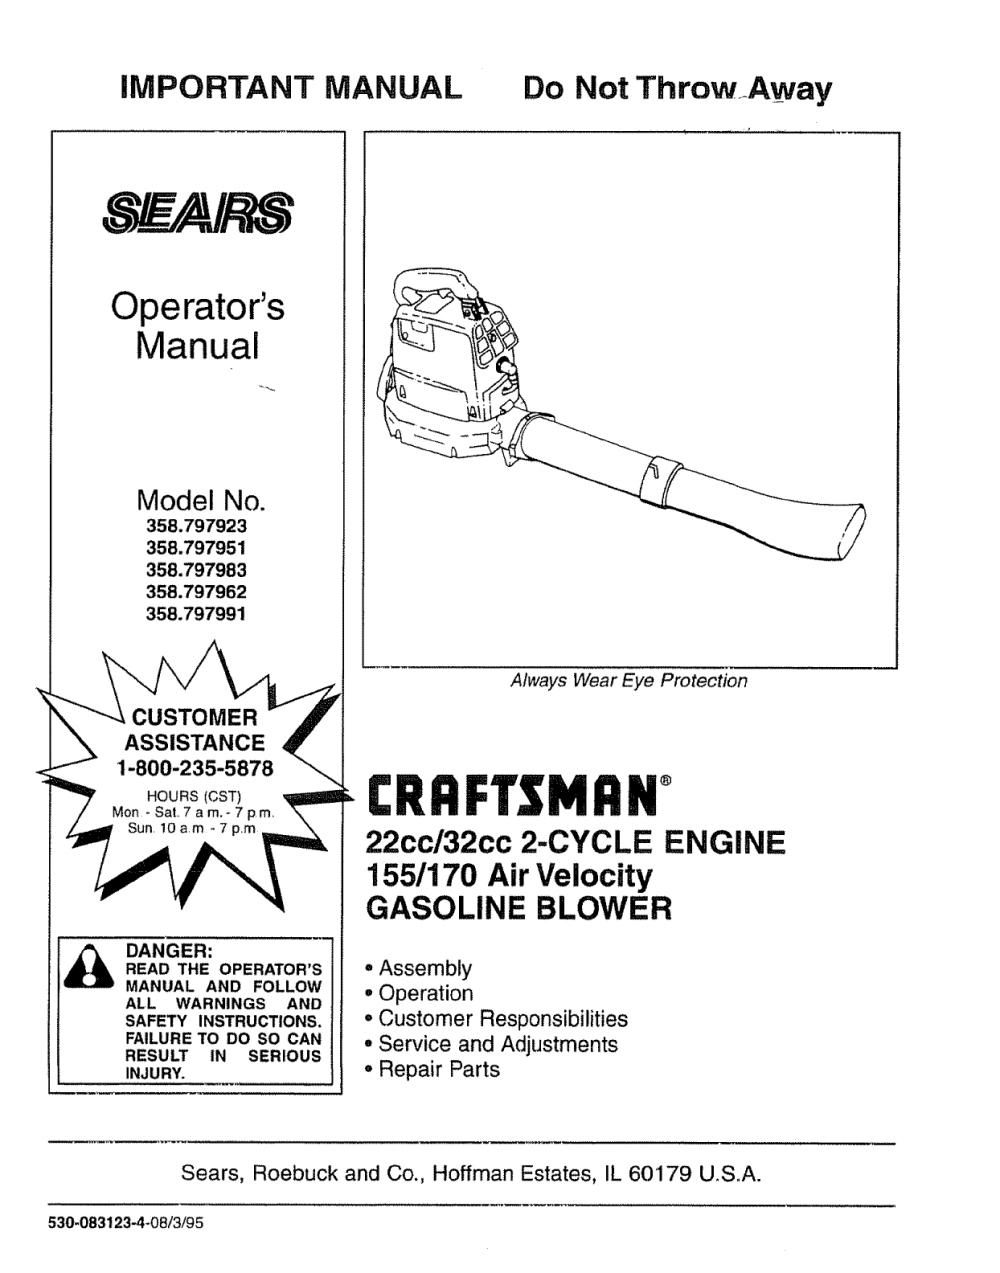 medium resolution of craftsman leaf blower wiring diagram wiring diagram centre craftsman 358797923 user manual leaf blower manuals and